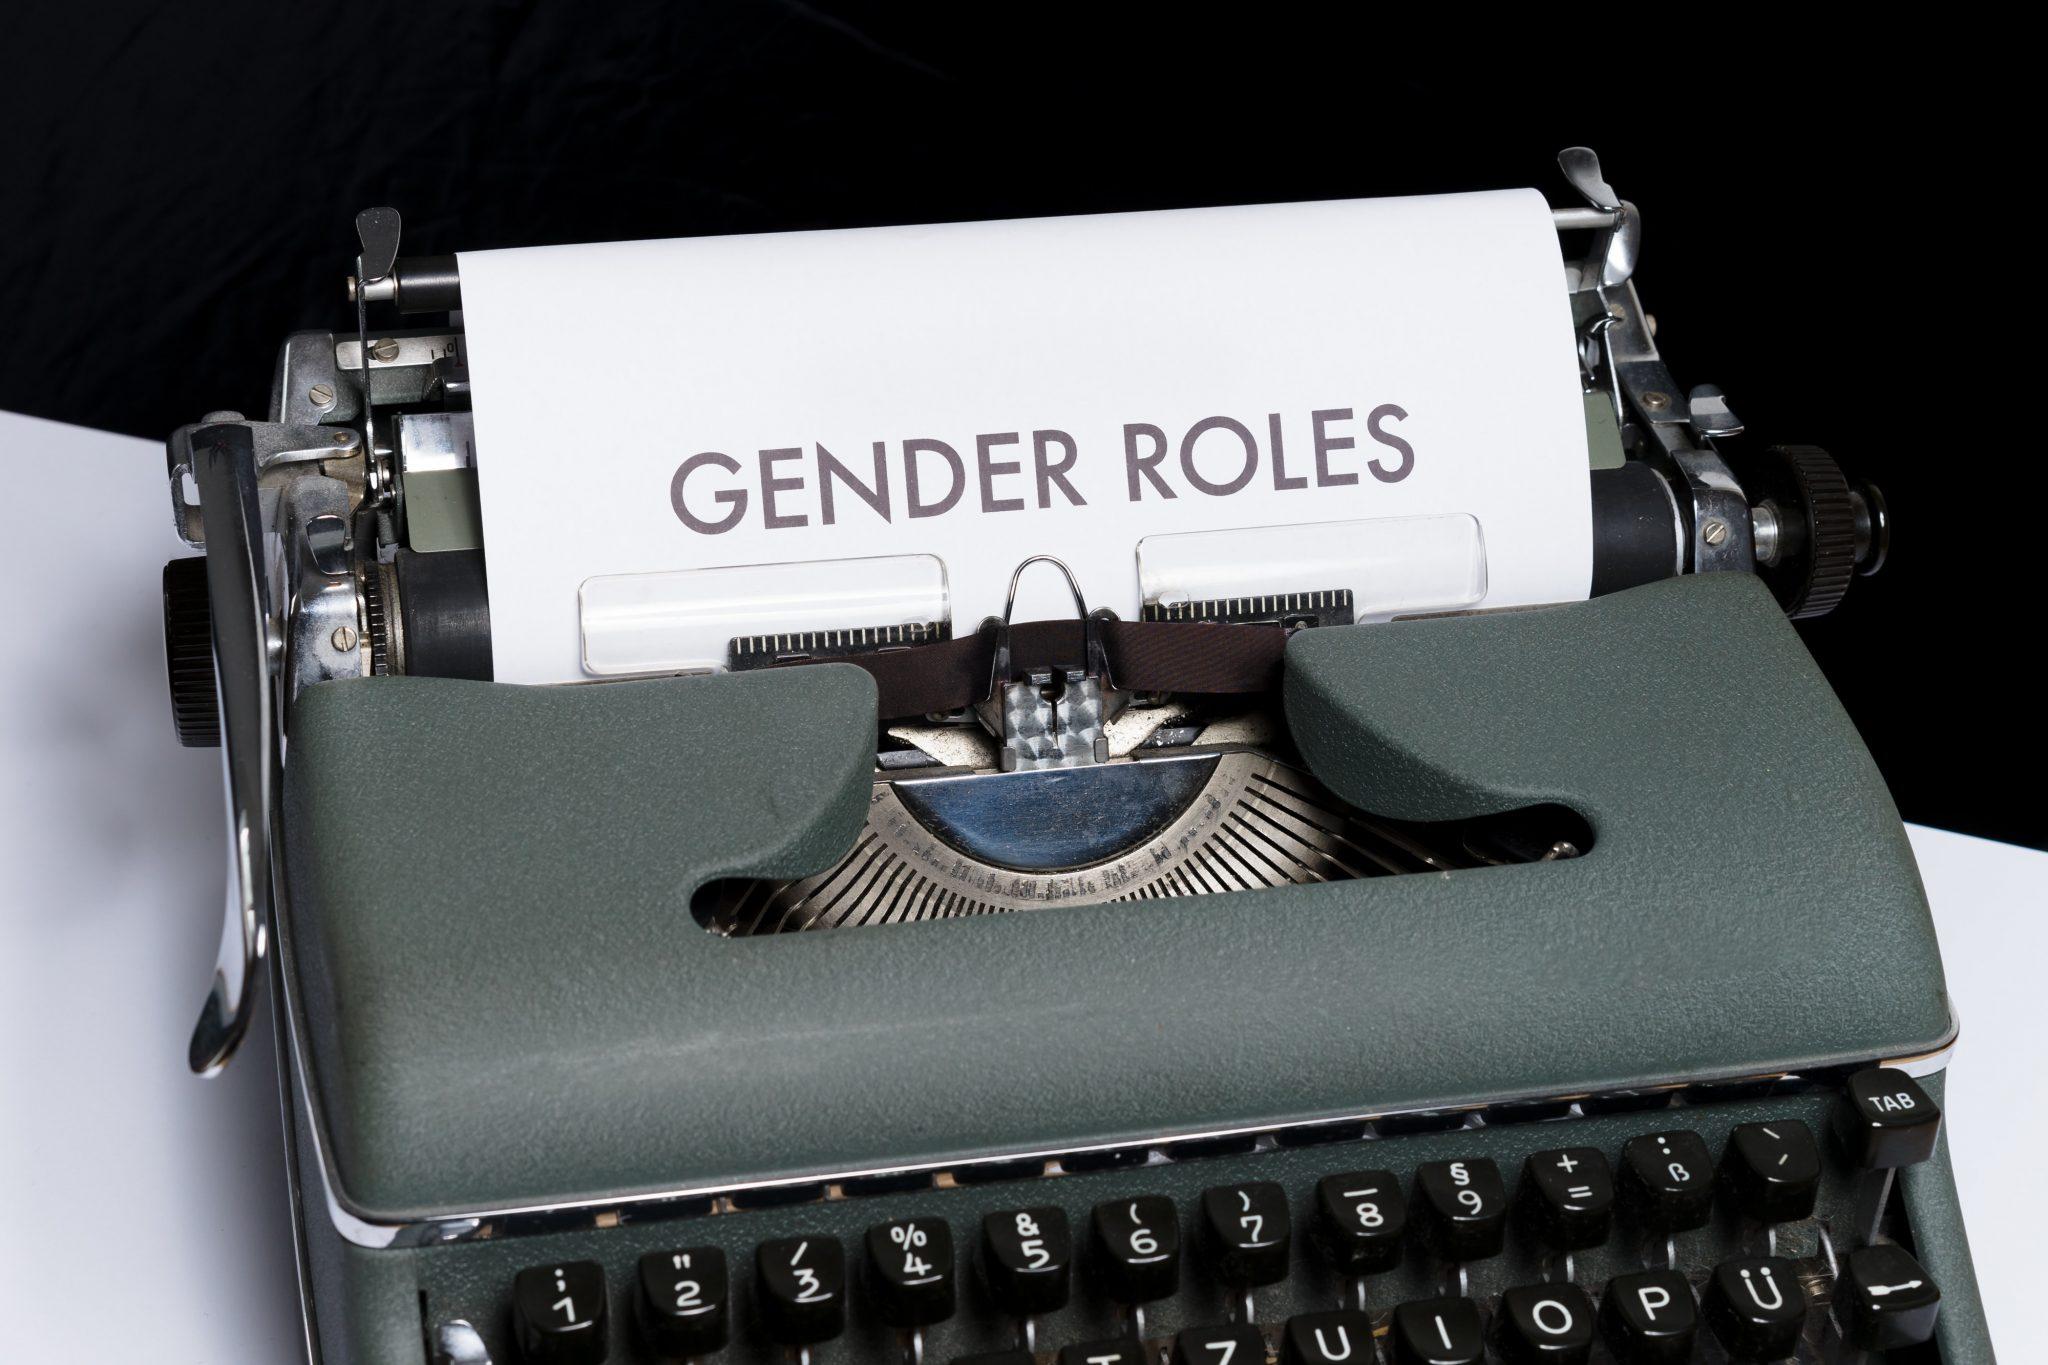 gender roles dpg